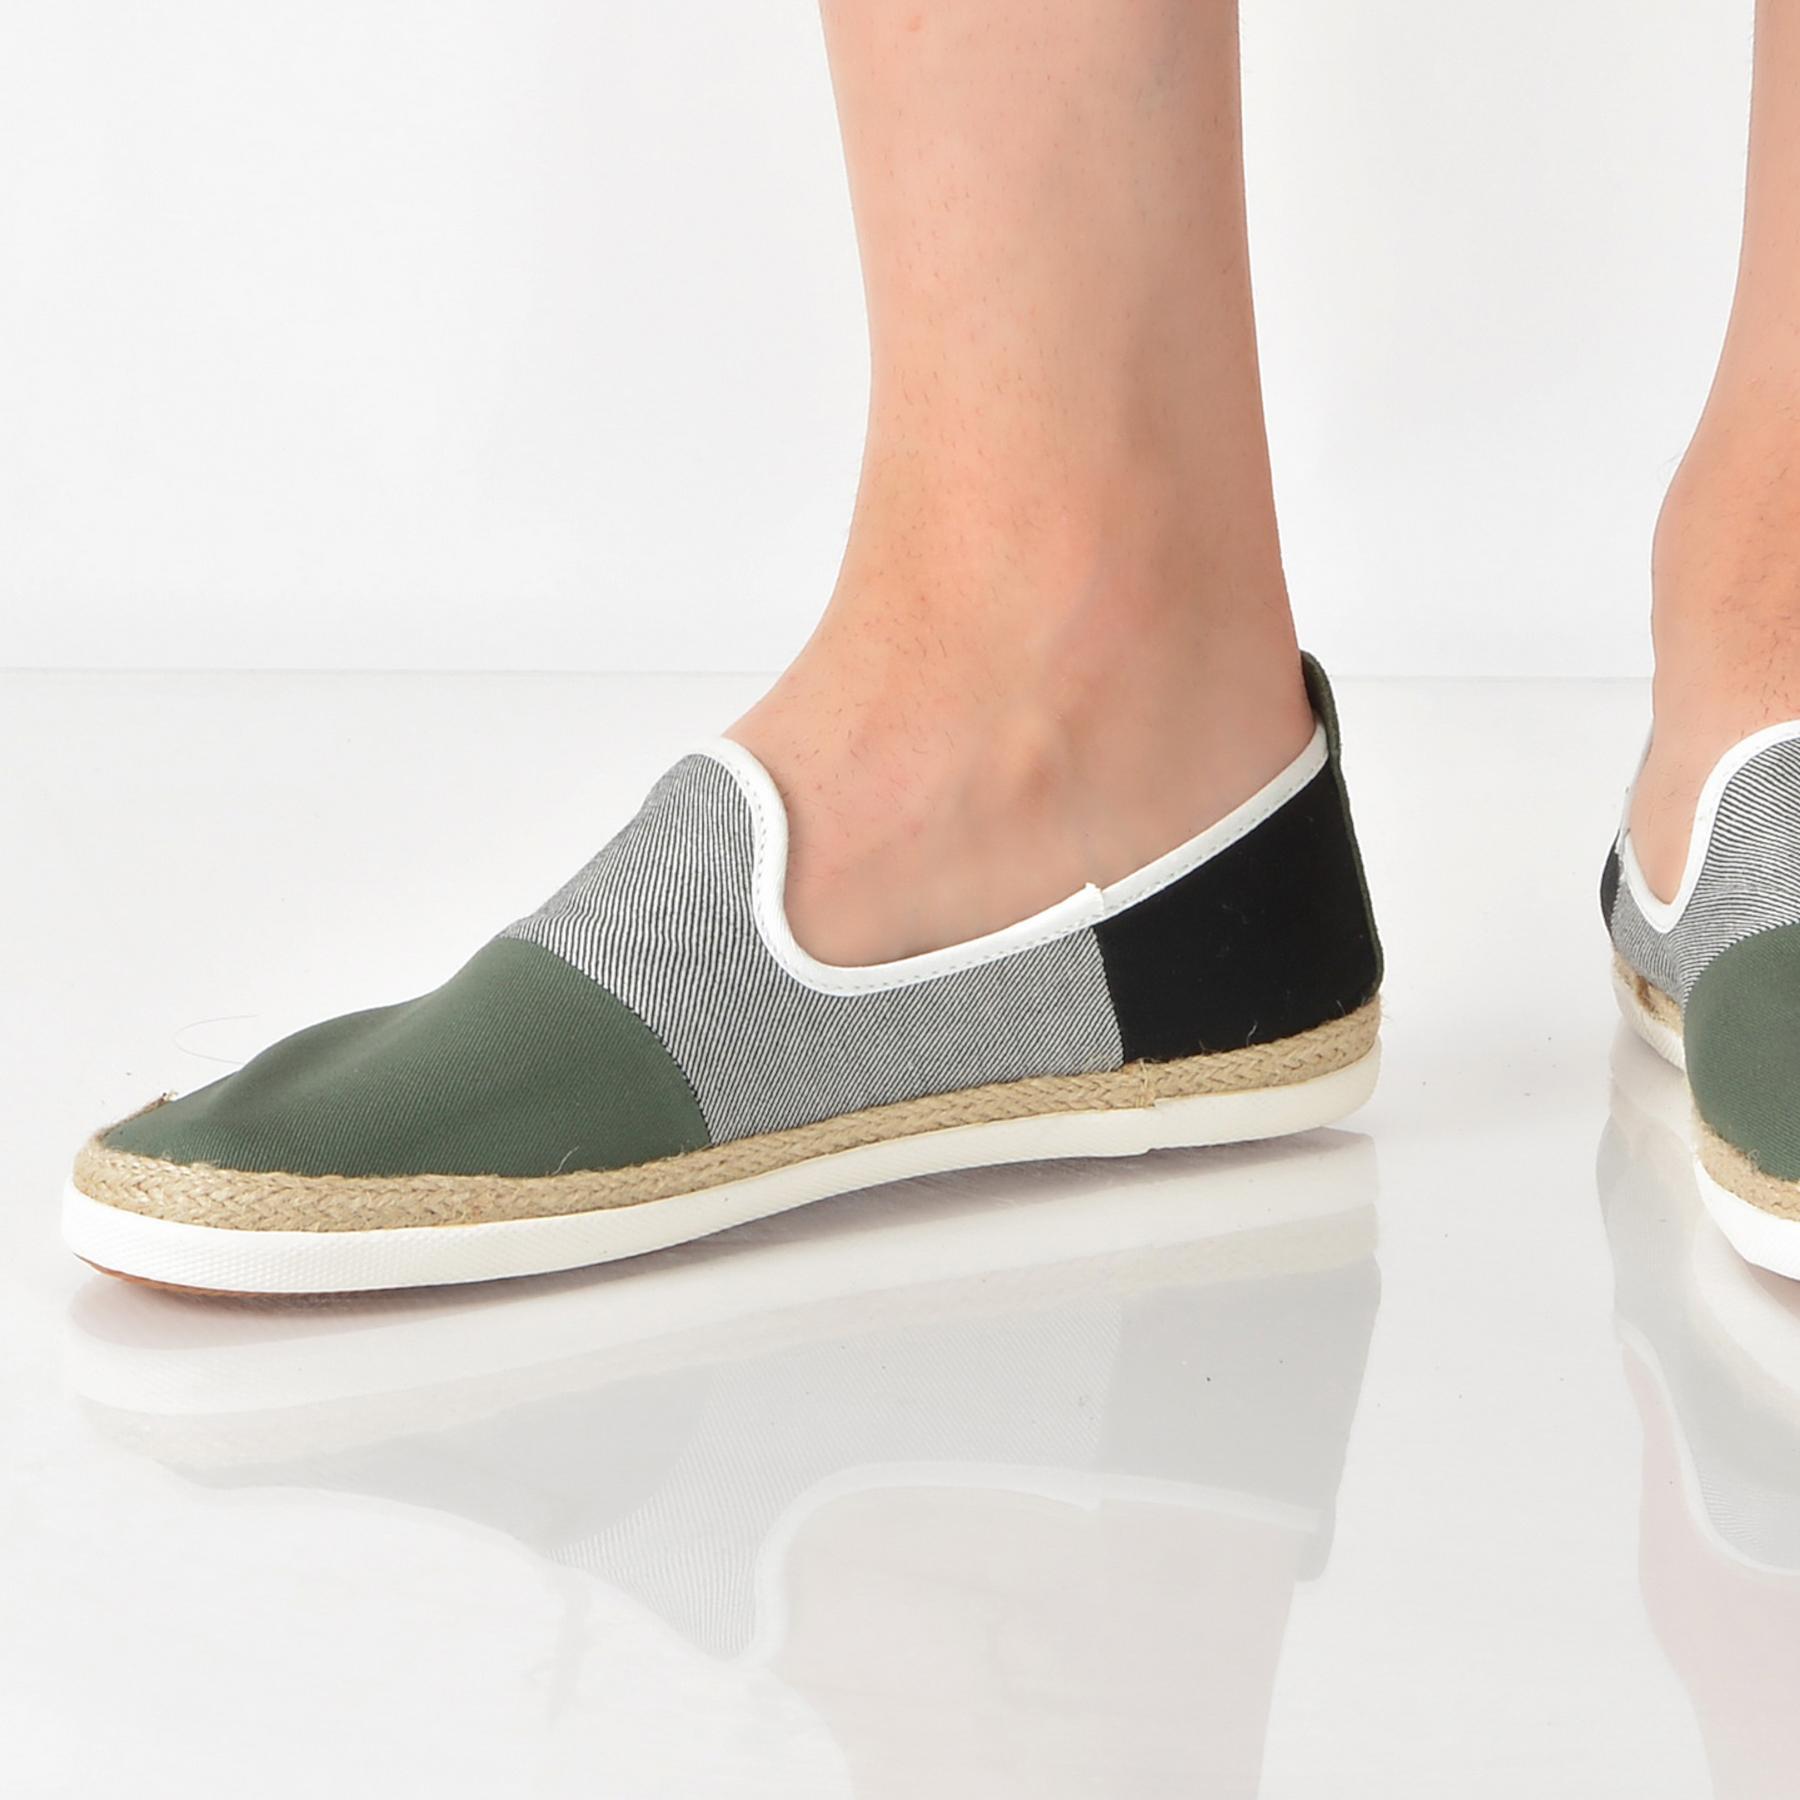 Espadrile Pepe Jeans Verzi, Ms10227, Din Material Textil